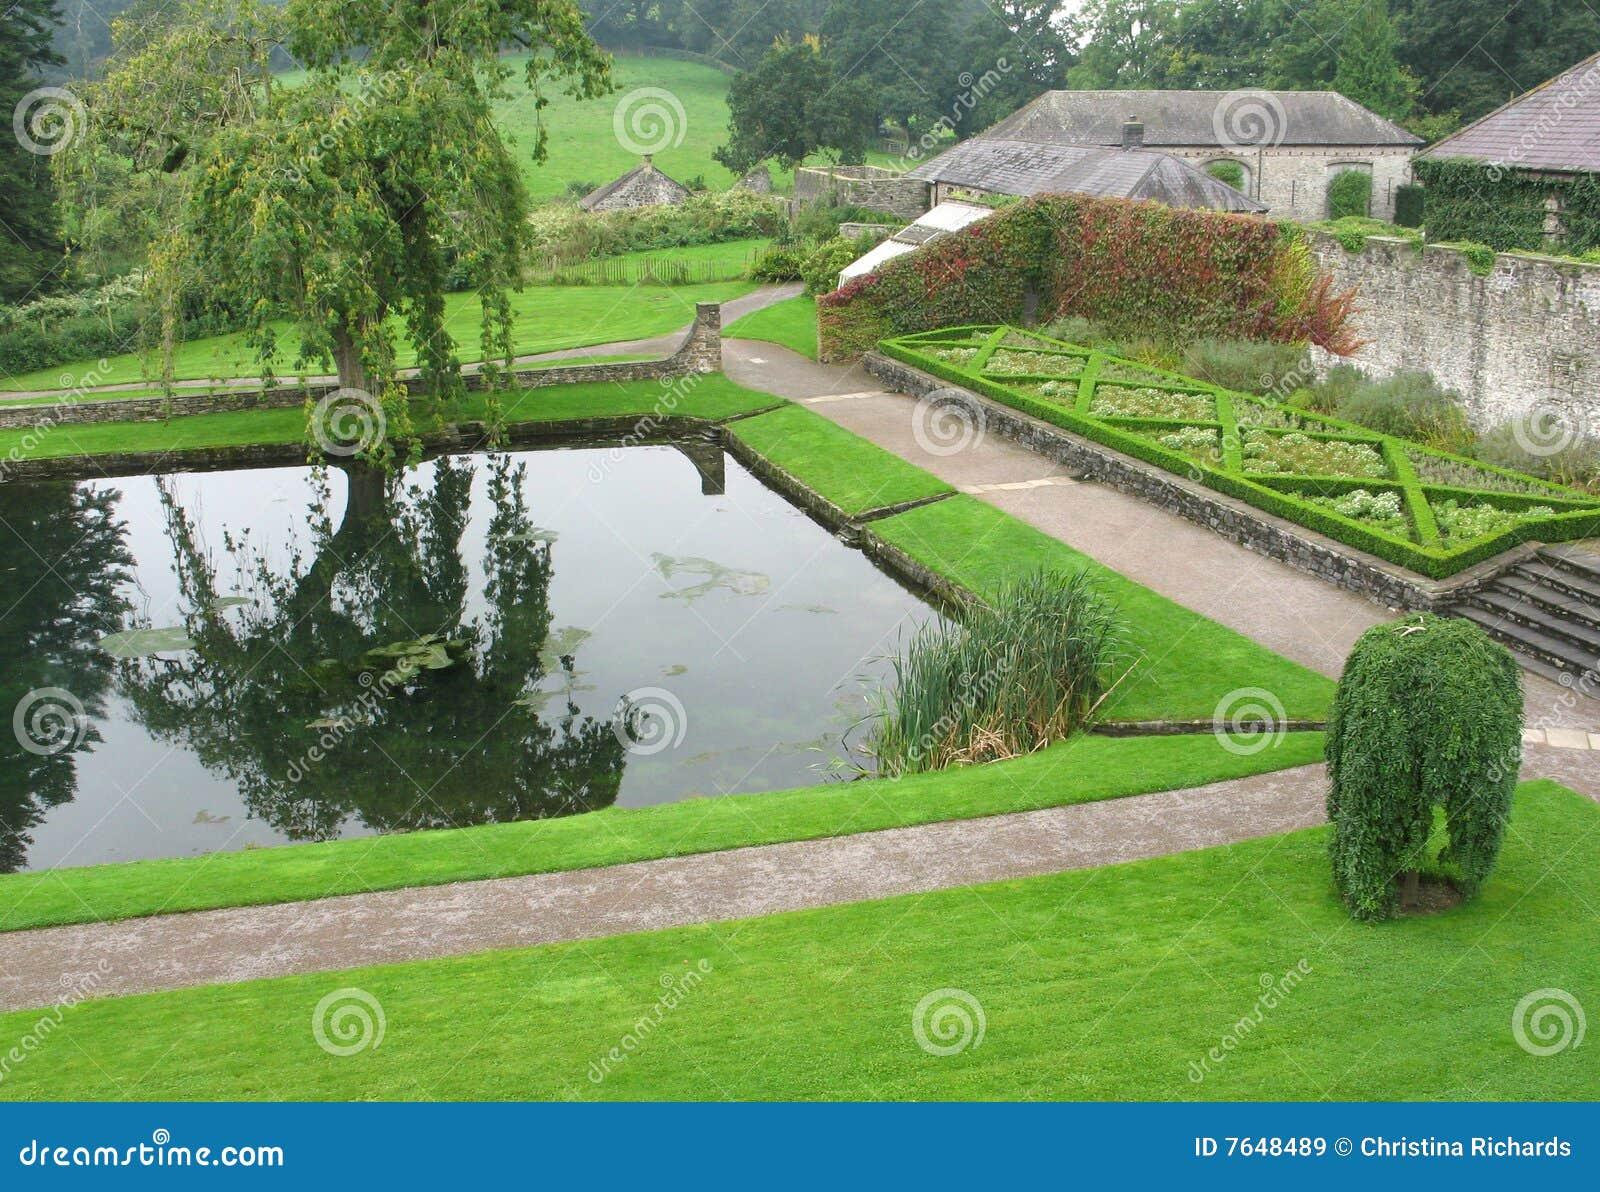 Pool at aberglasney garden wales uk royalty free stock for Garden pool uk